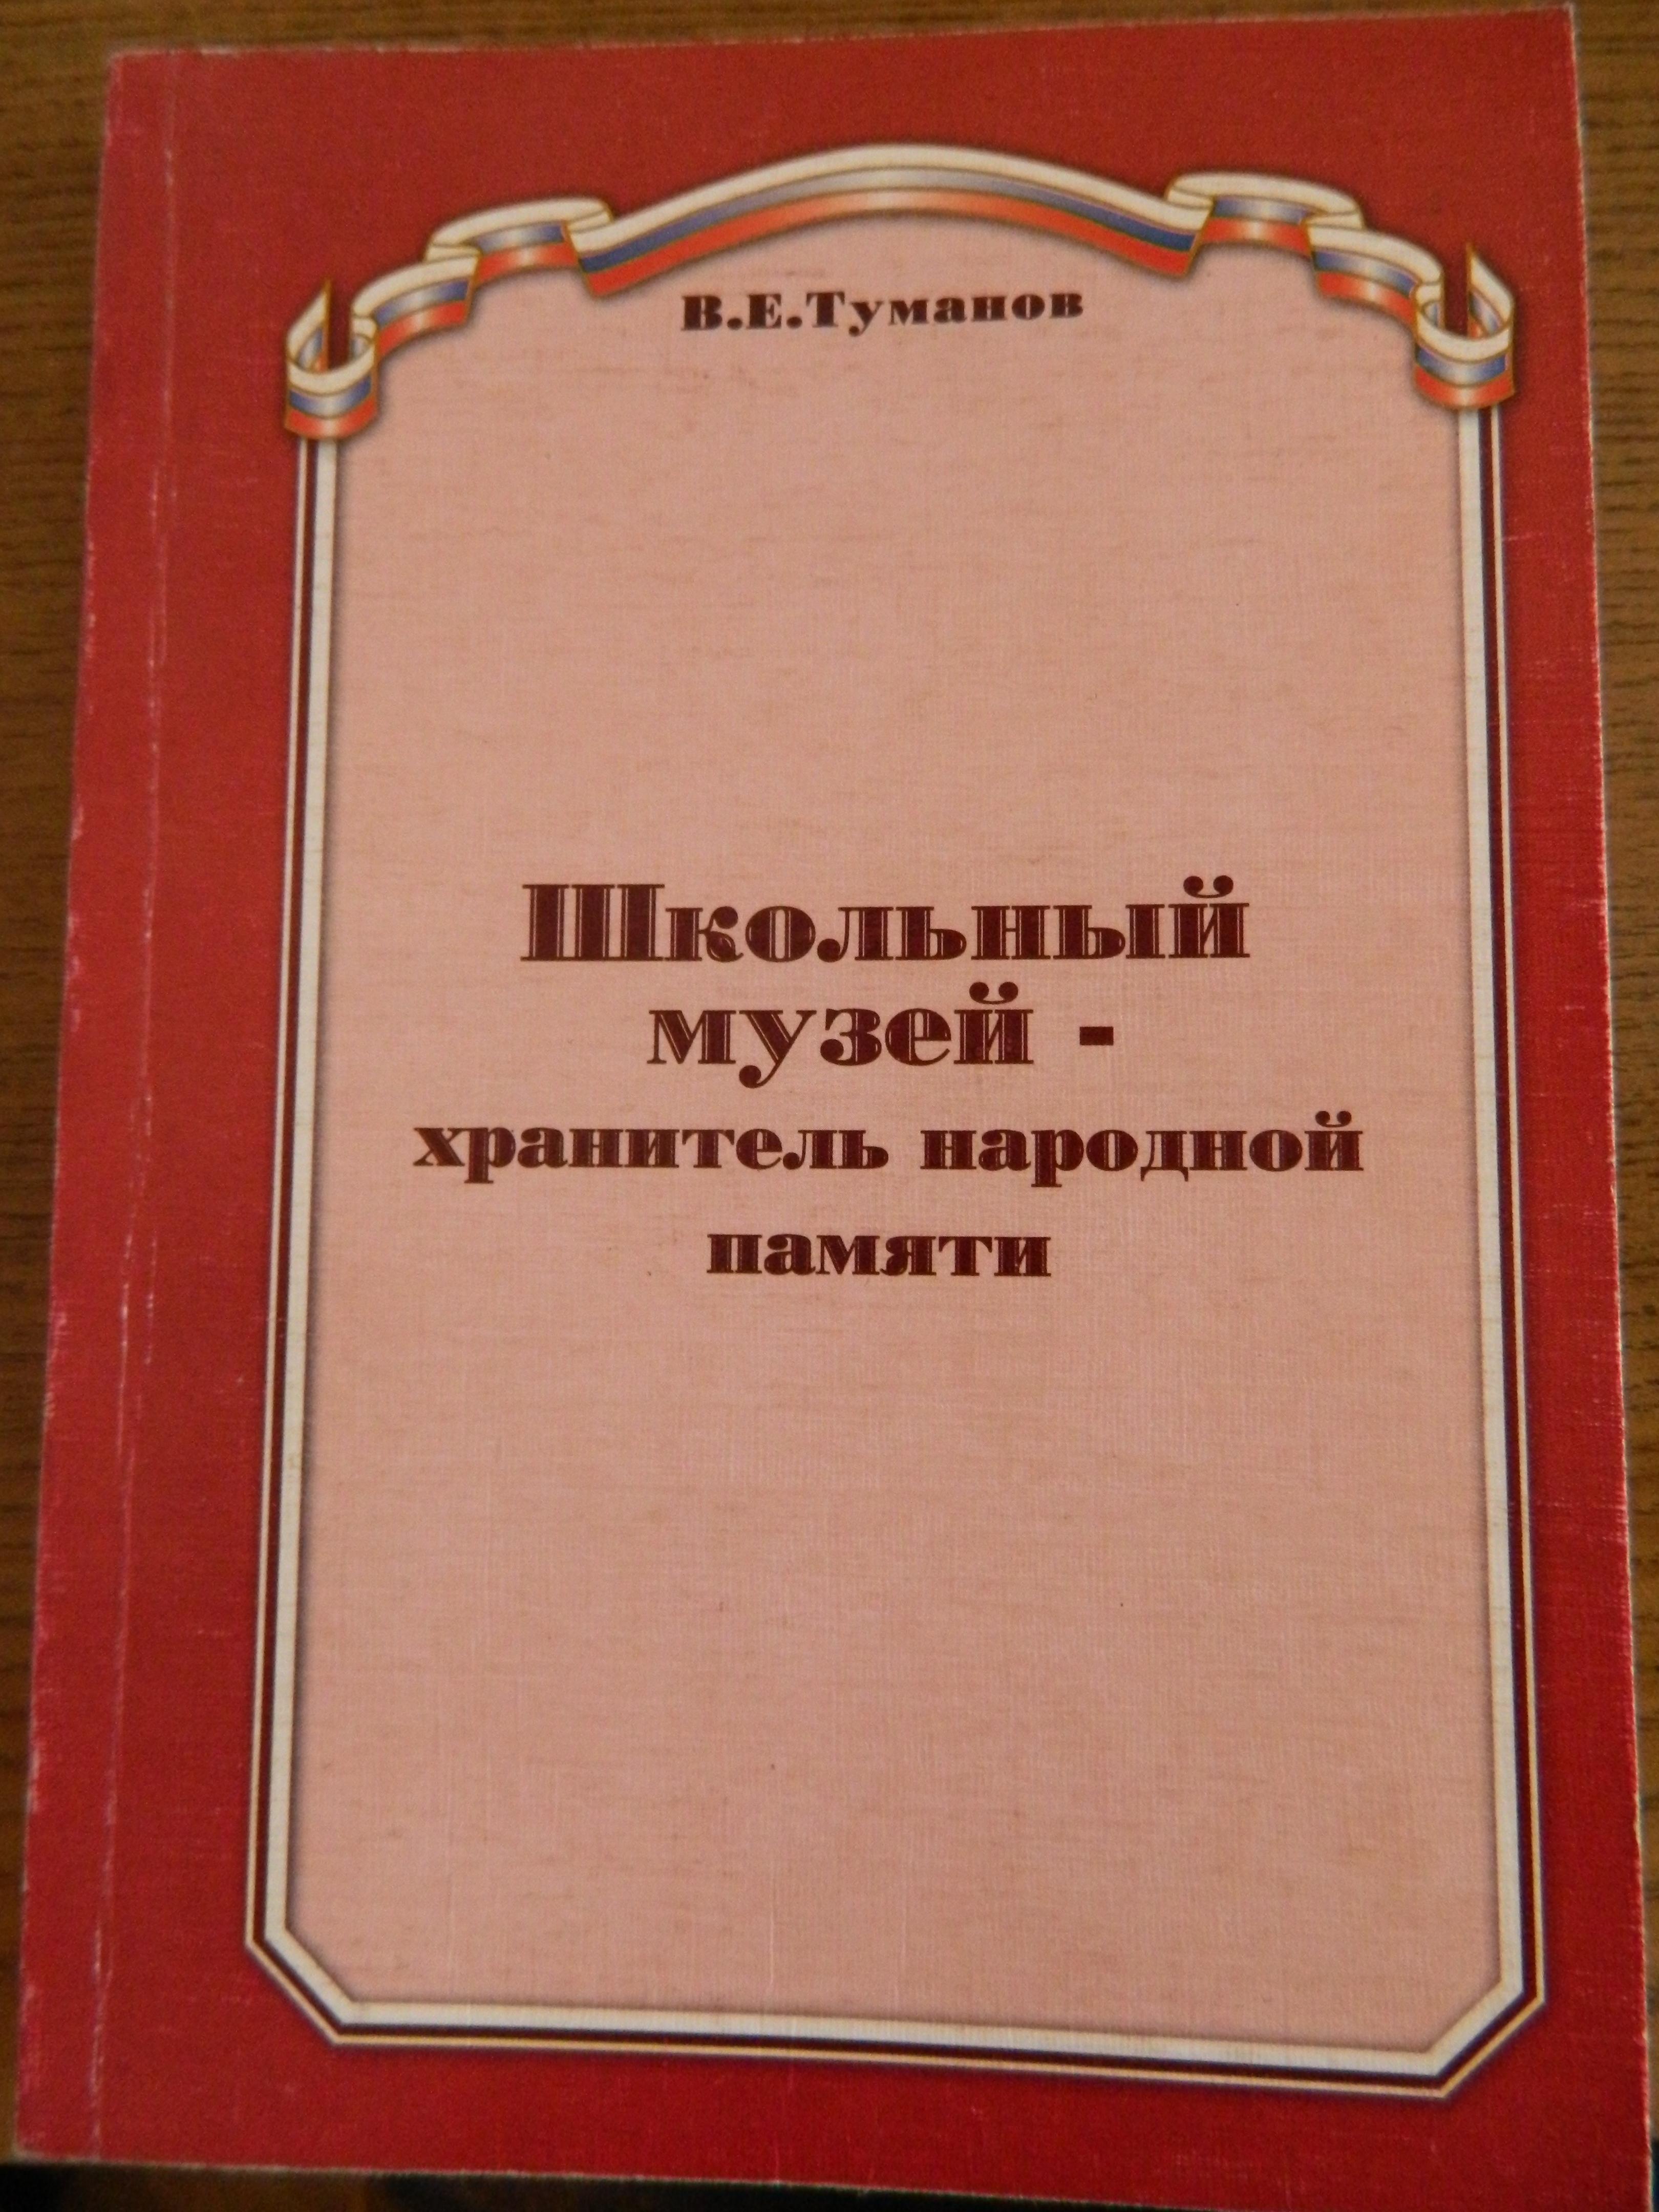 Программа Школьных Кружков